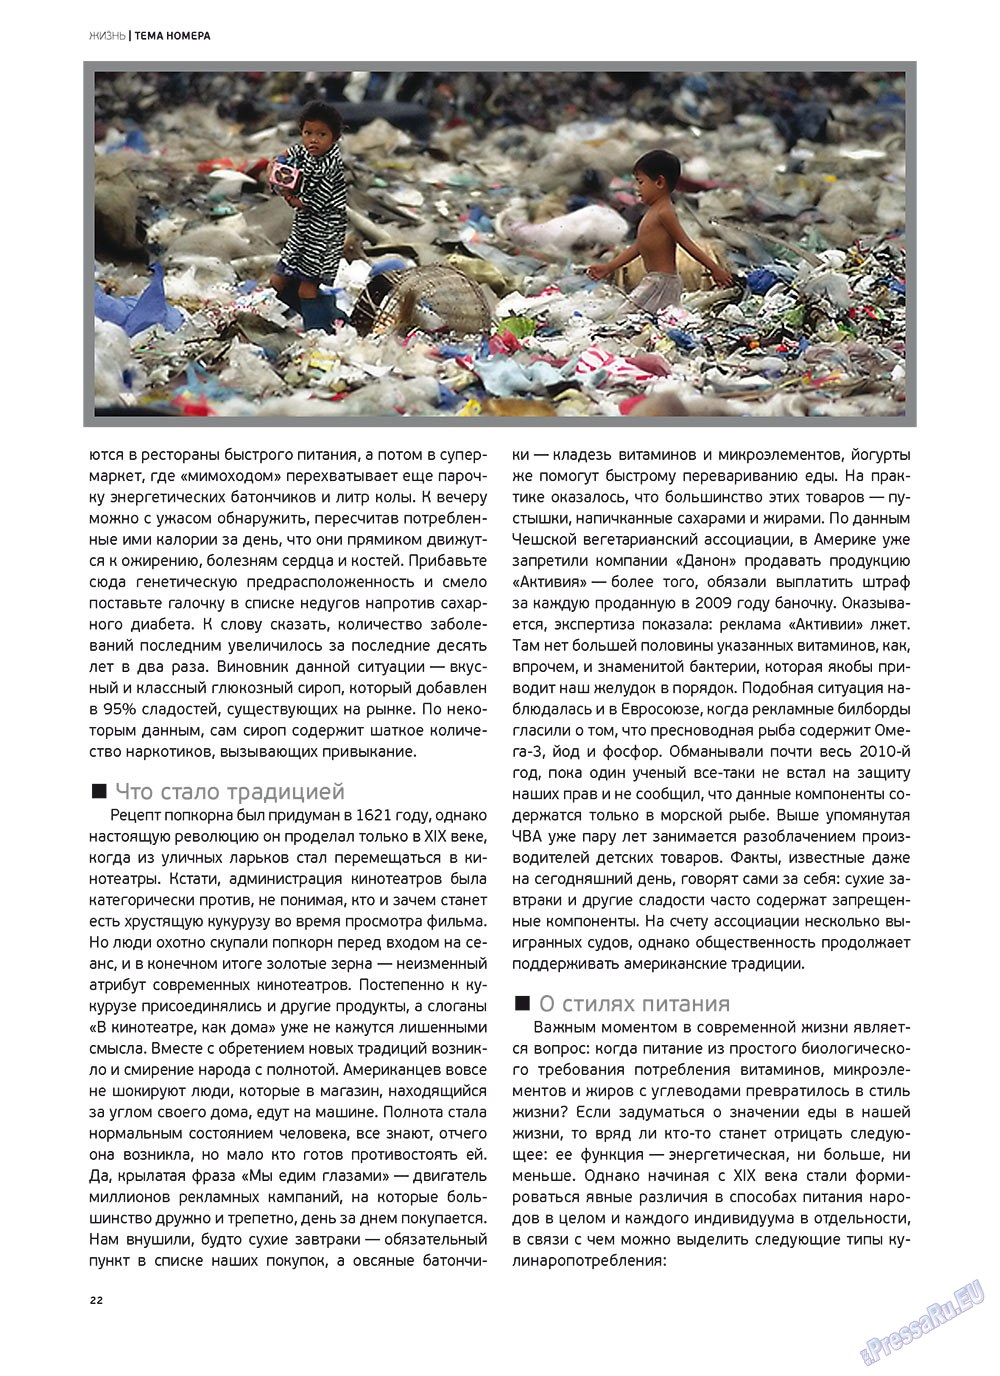 Артек (журнал). 2011 год, номер 4, стр. 24